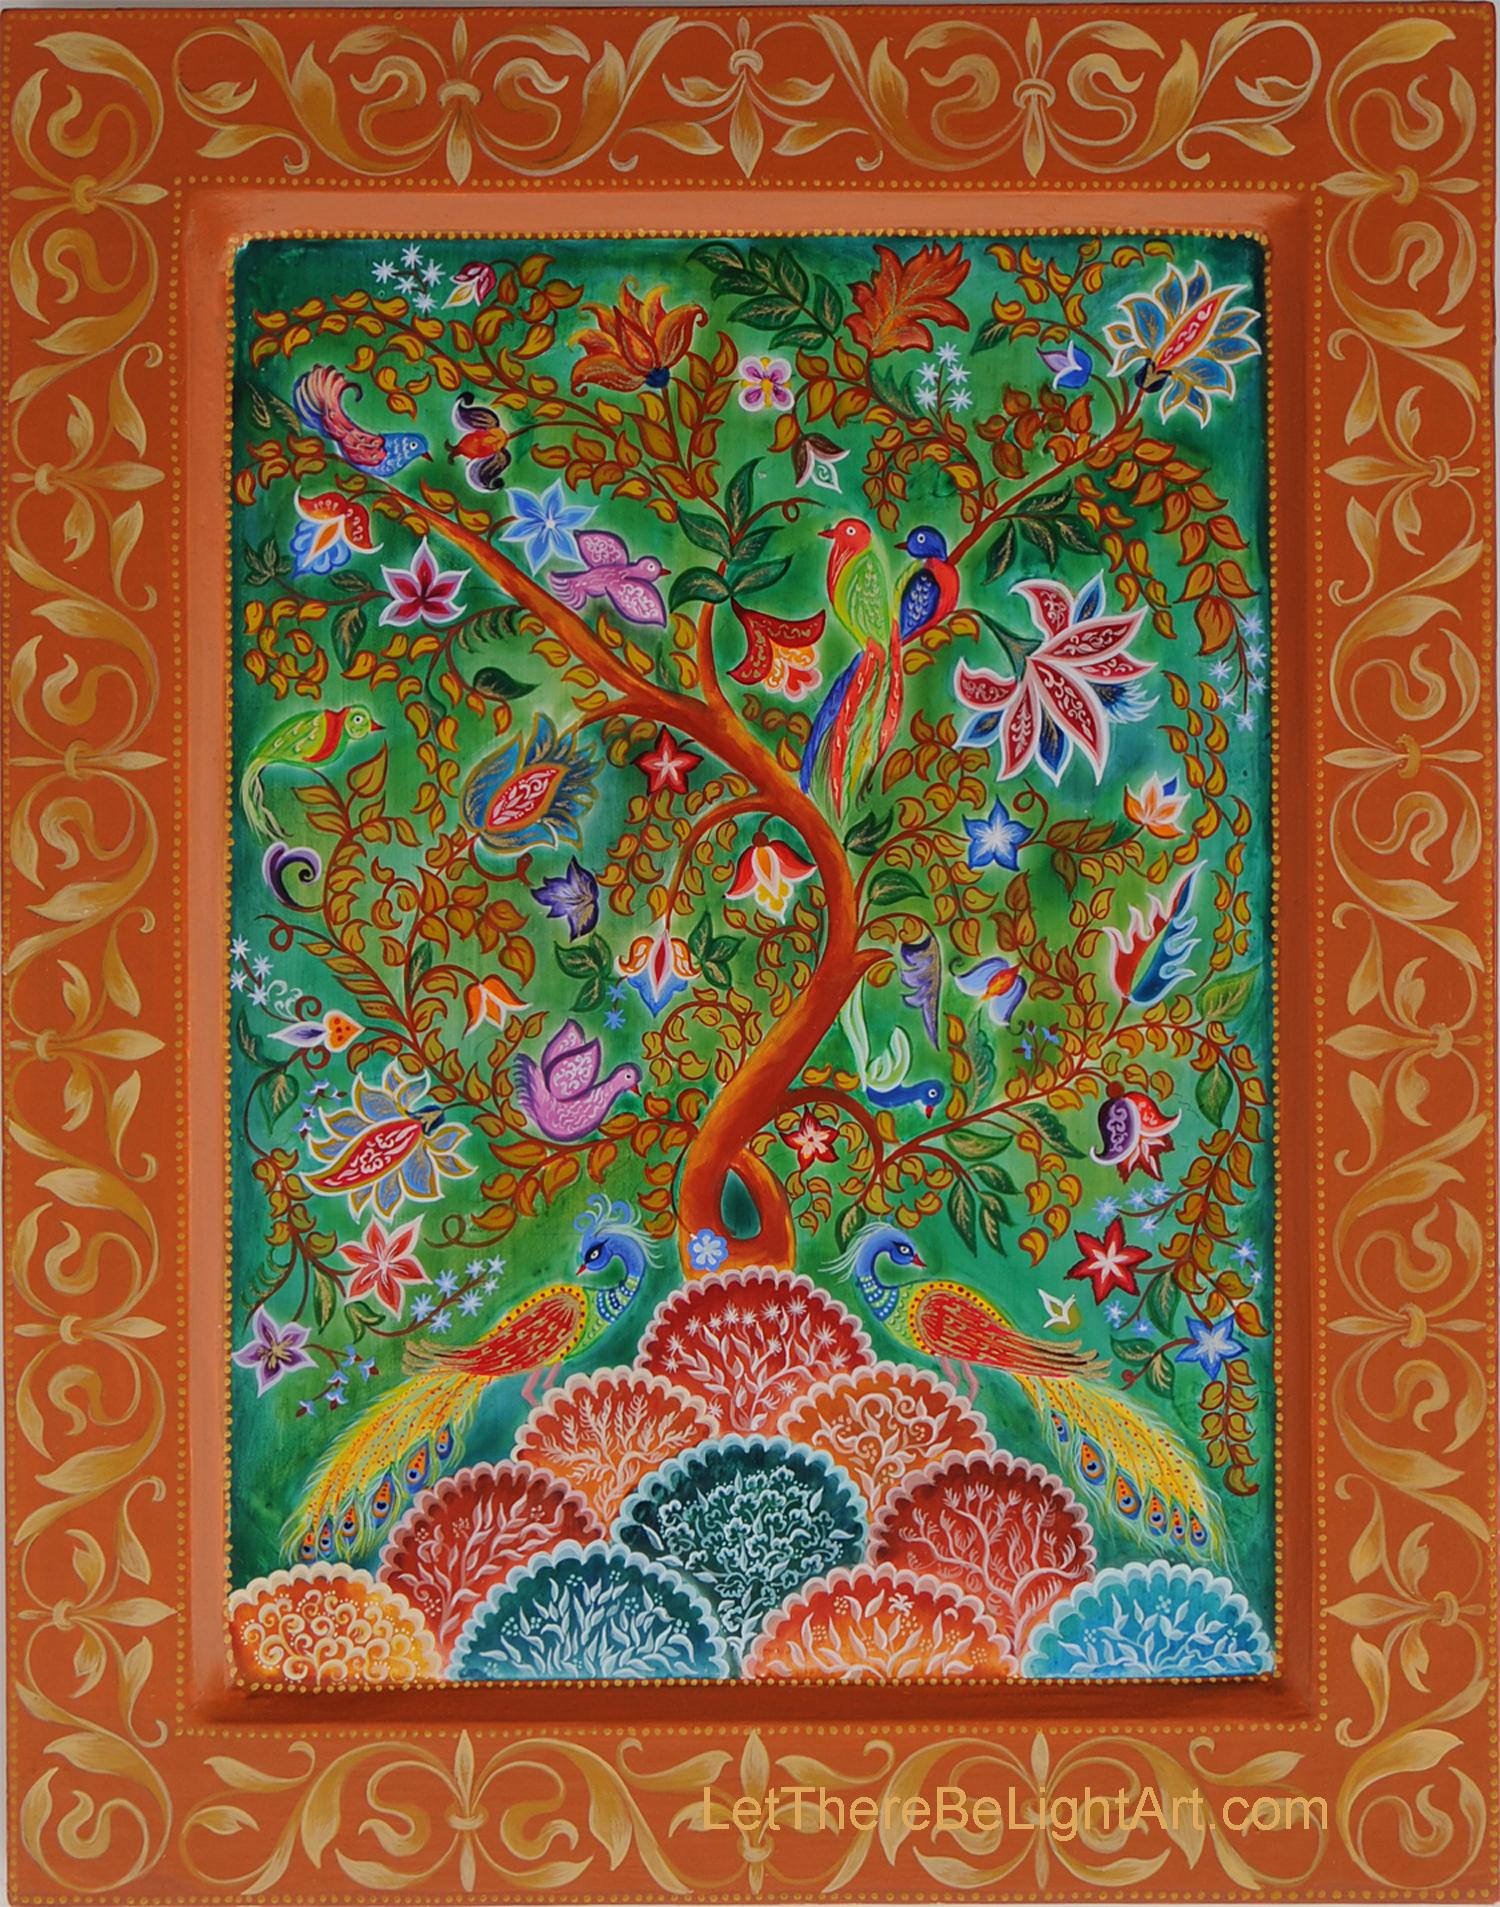 The Tree of Life - Paradise